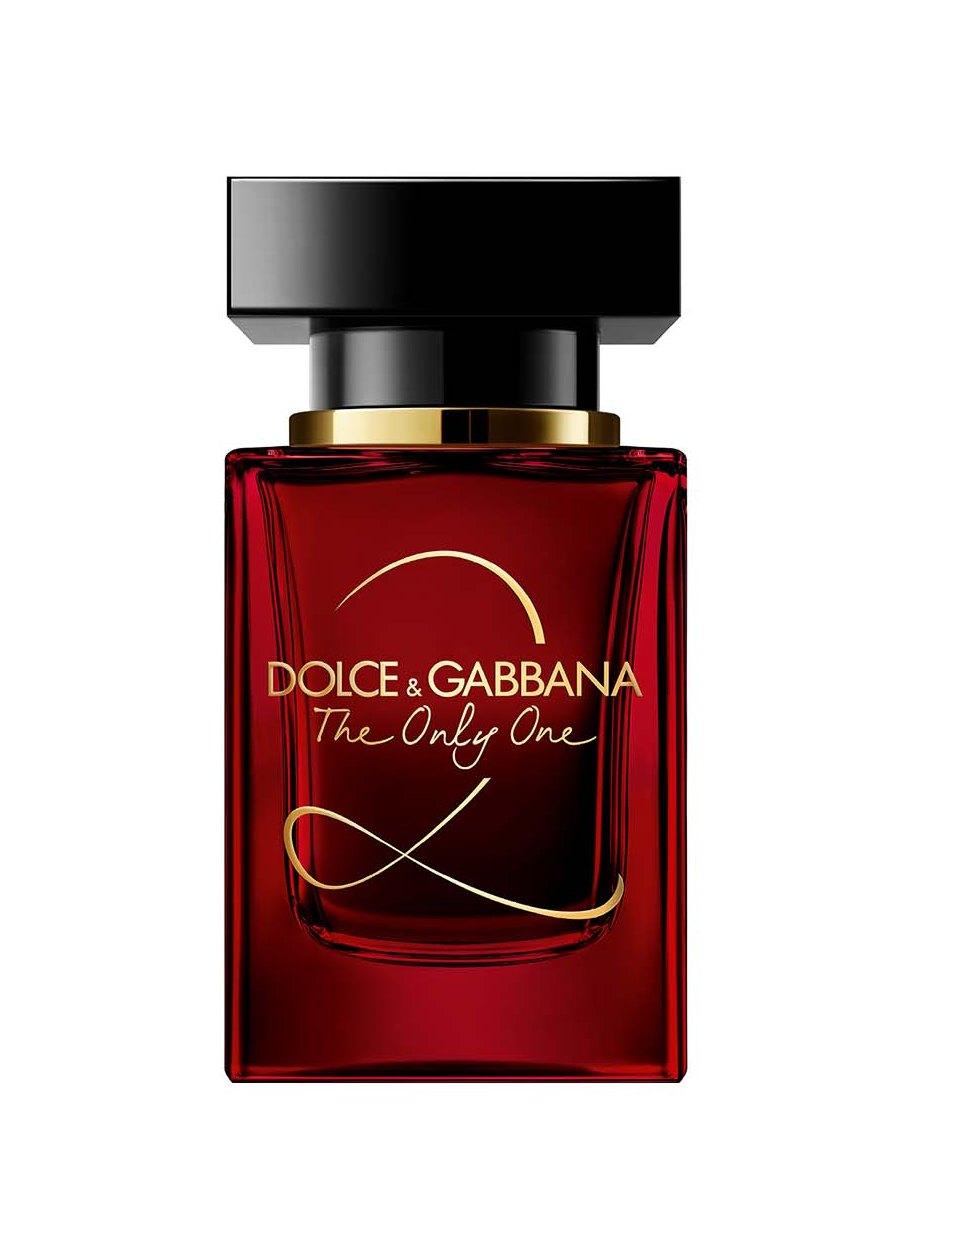 Dolce & Gabanna The Only One 2 Eau De Parfume